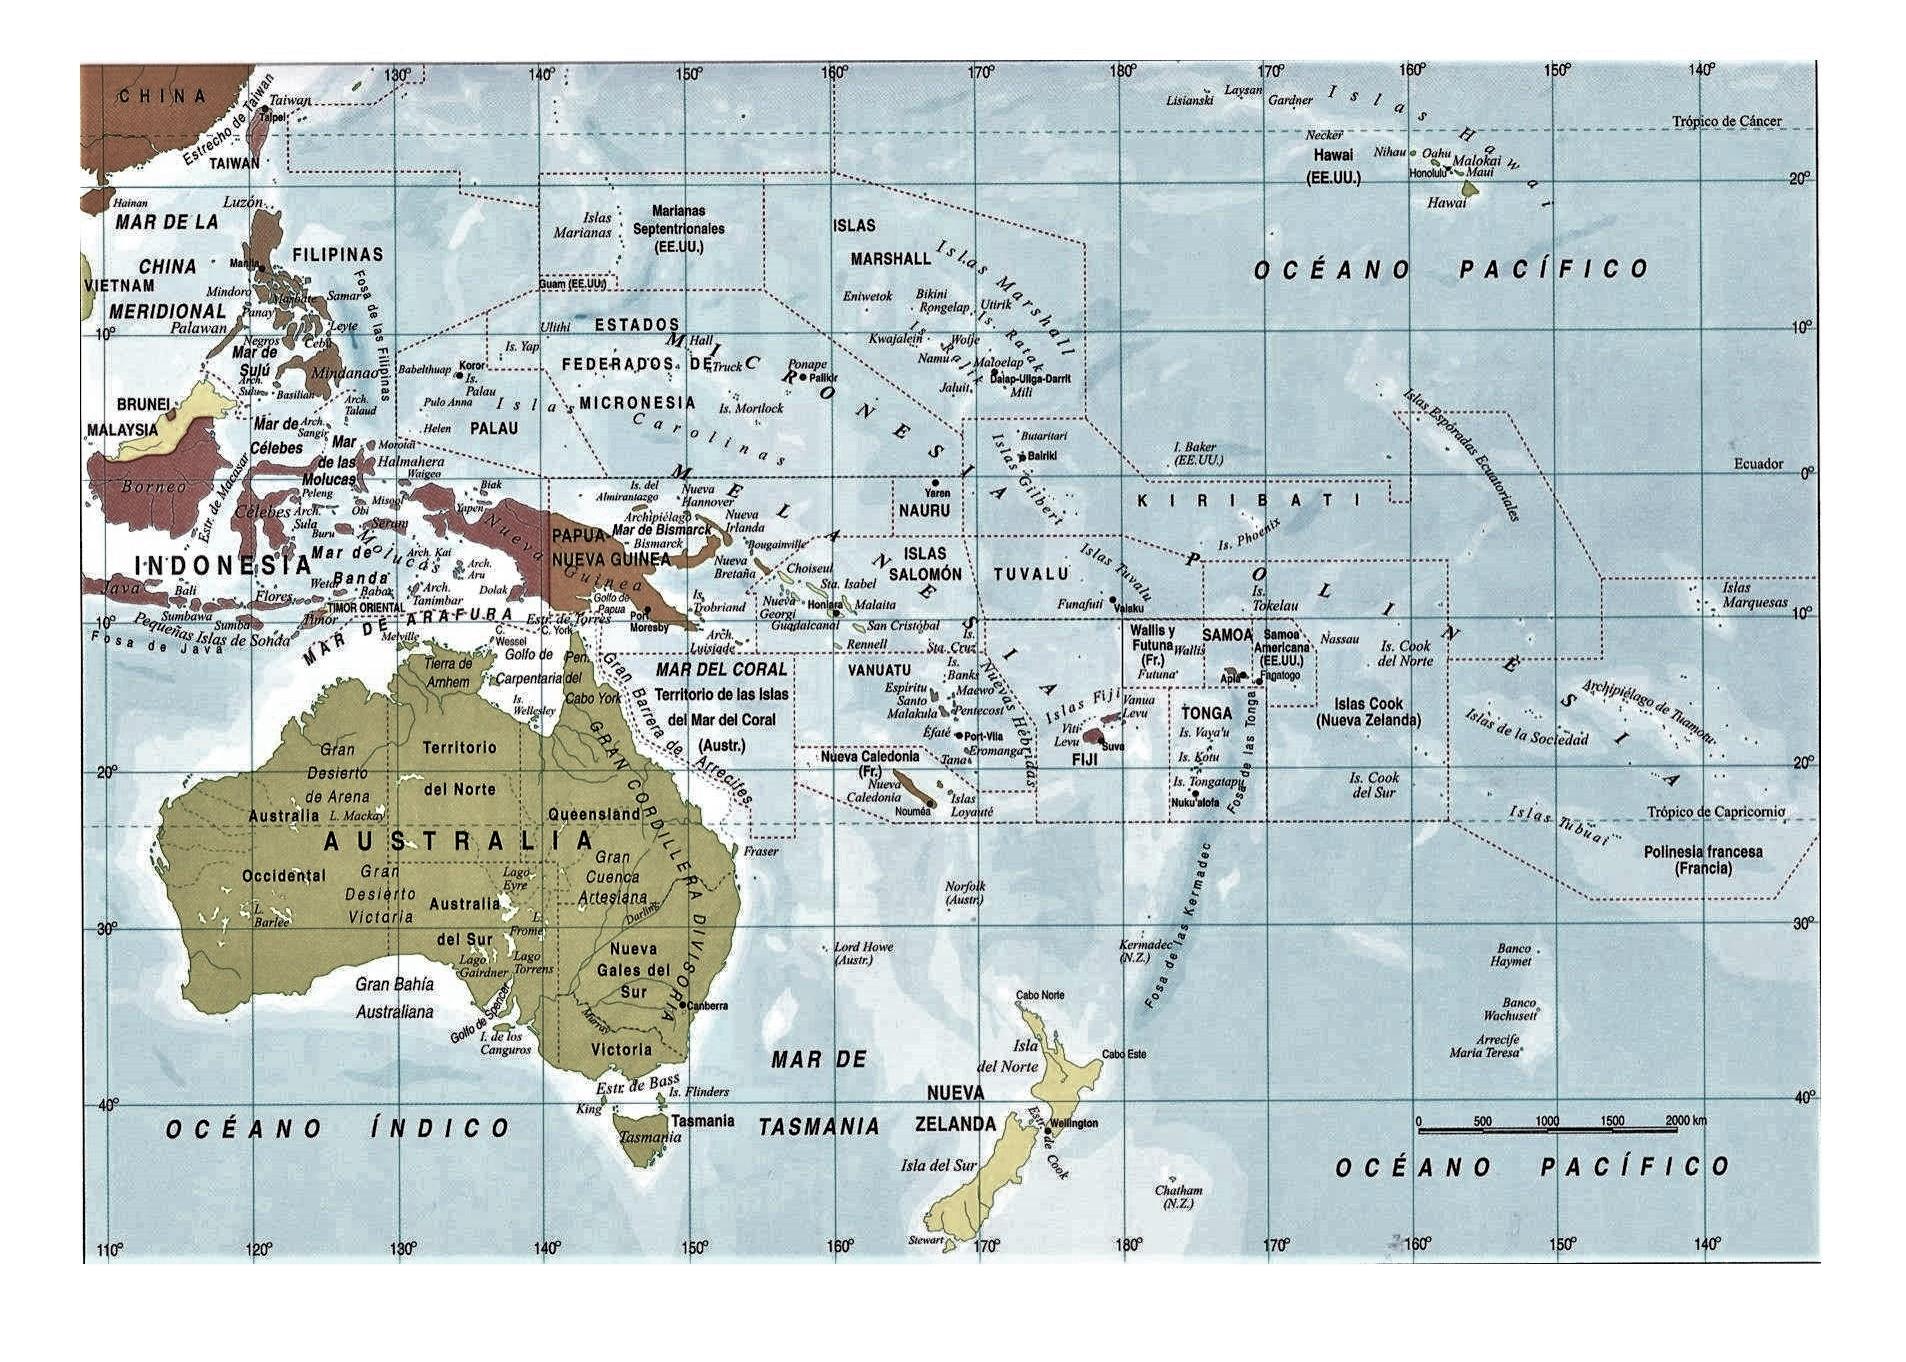 Mapa De Oceania Fisico En Español.Mapa De Oceania Politico Fisico Con Nombres